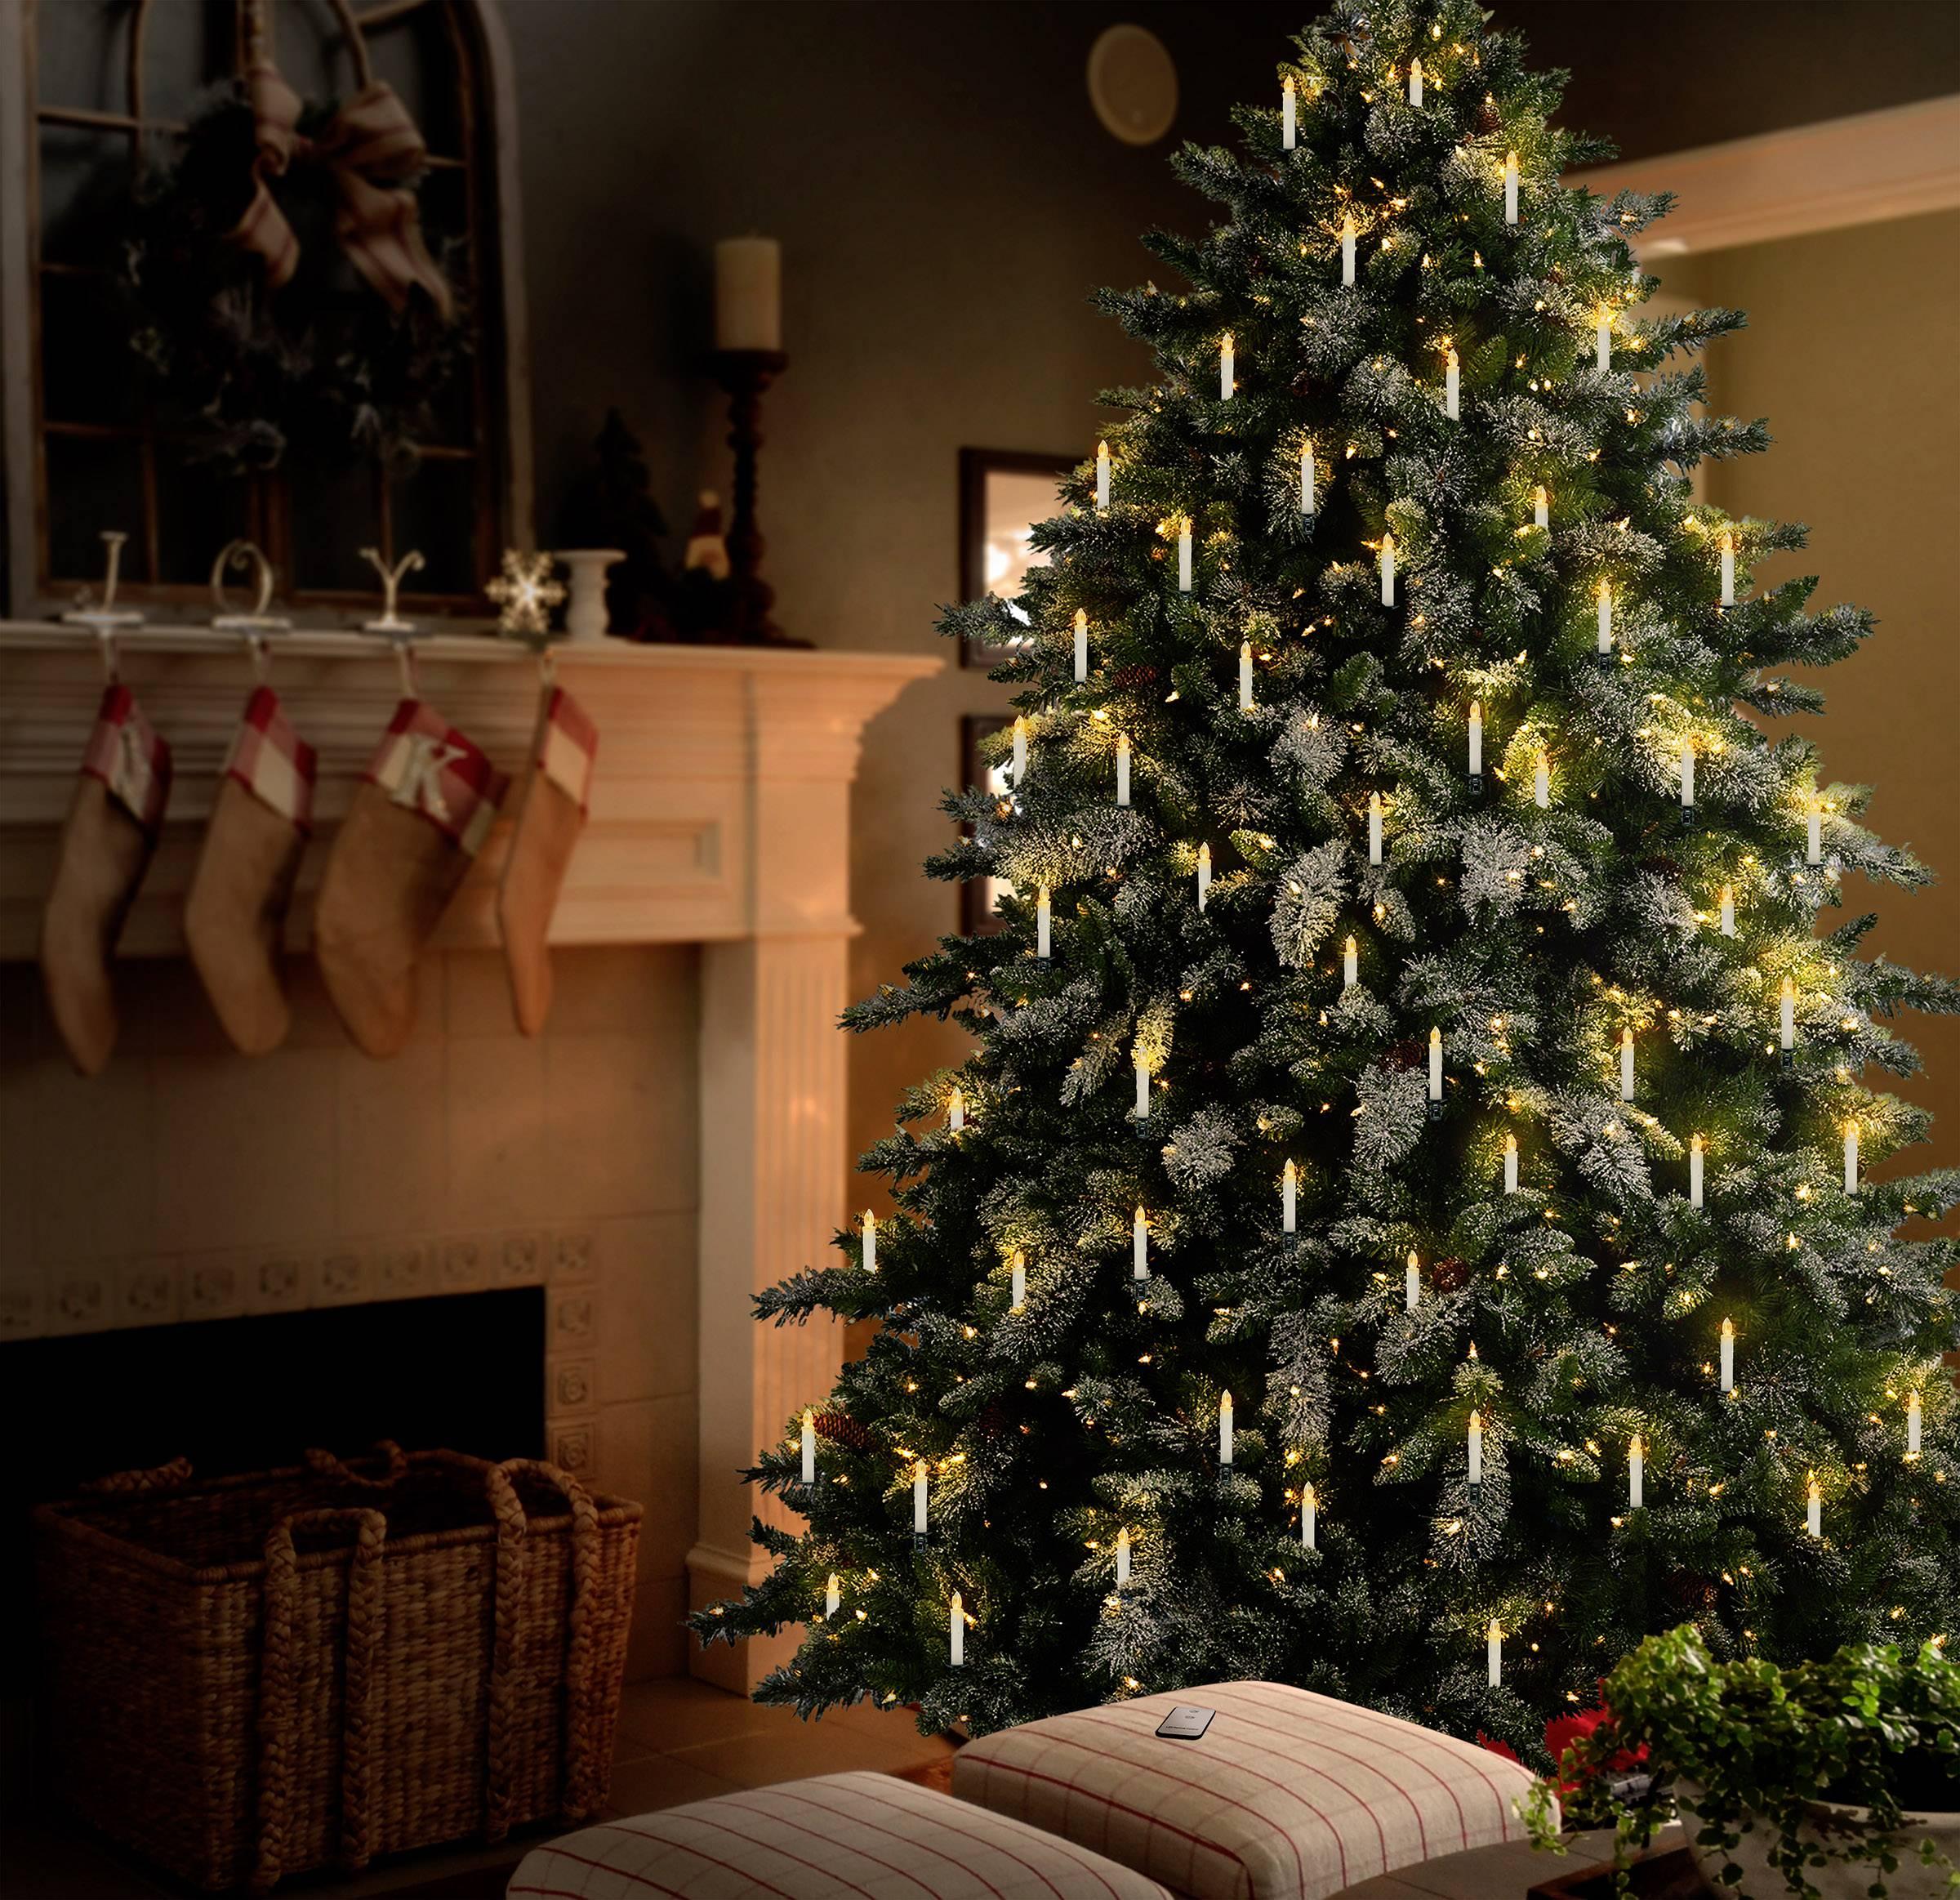 Funk weihnachtsbaum beleuchtung innen batteriebetrieben ...